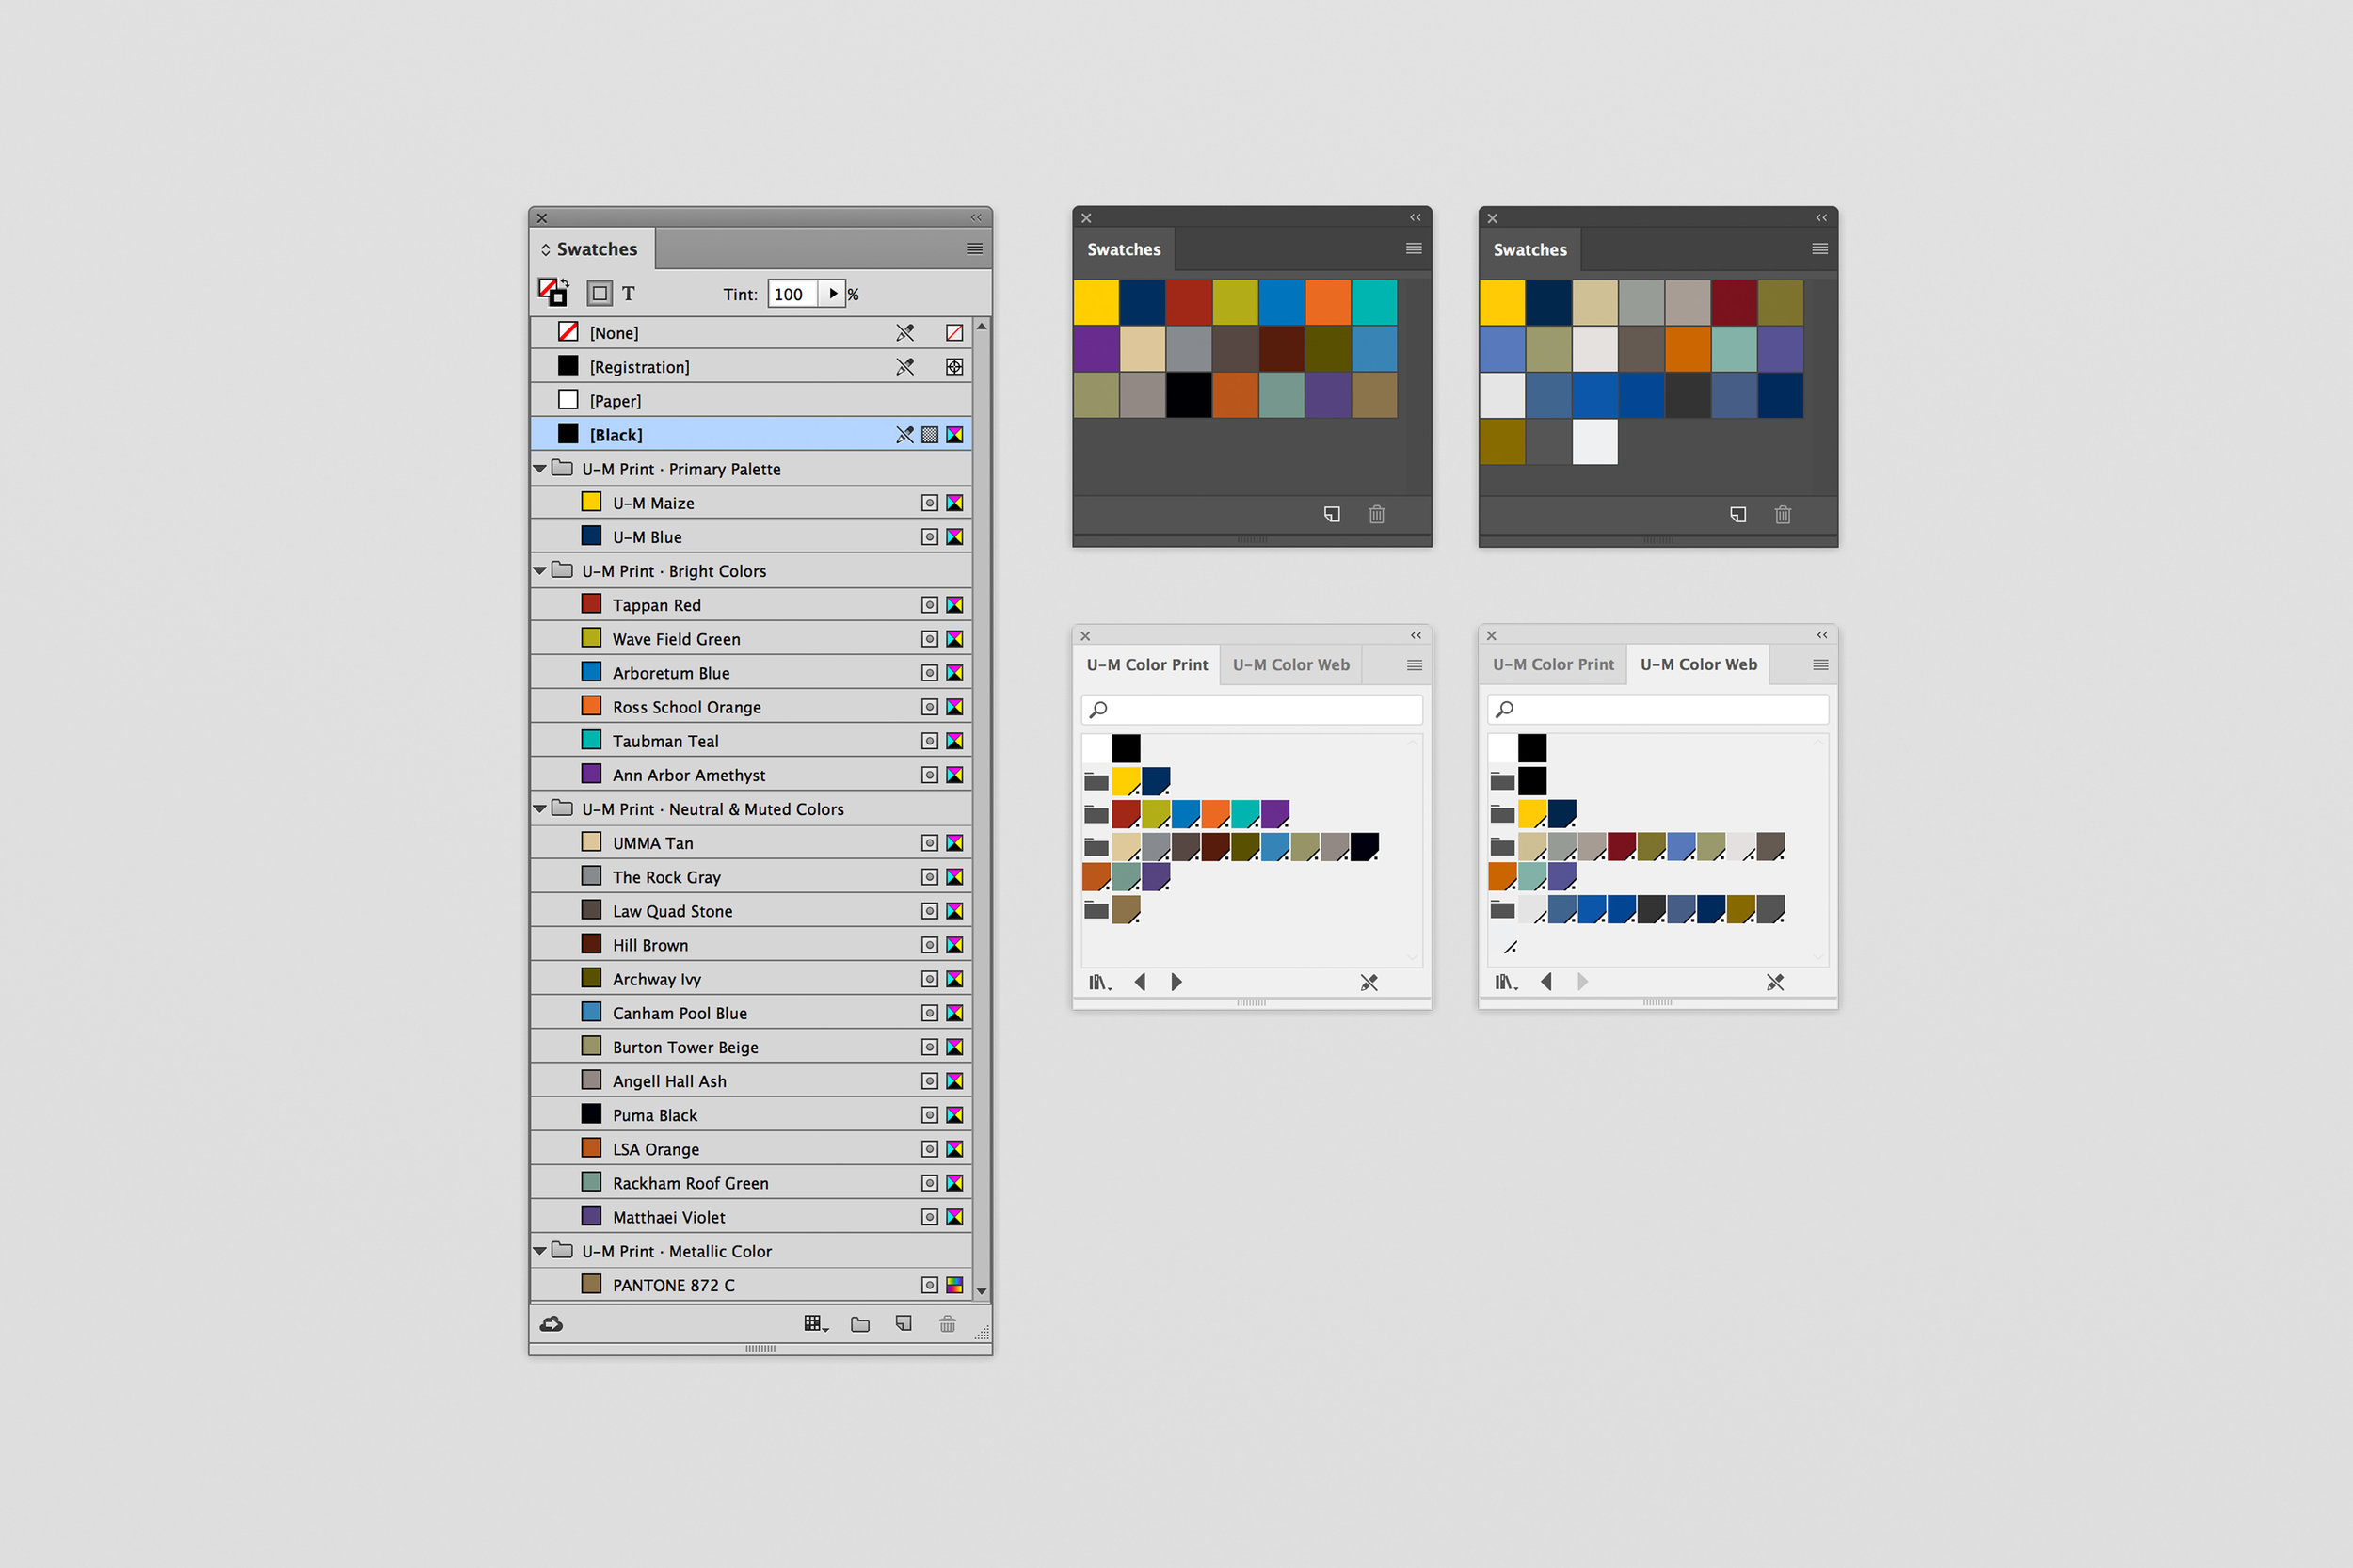 U-M-color-5_3x2c.jpg